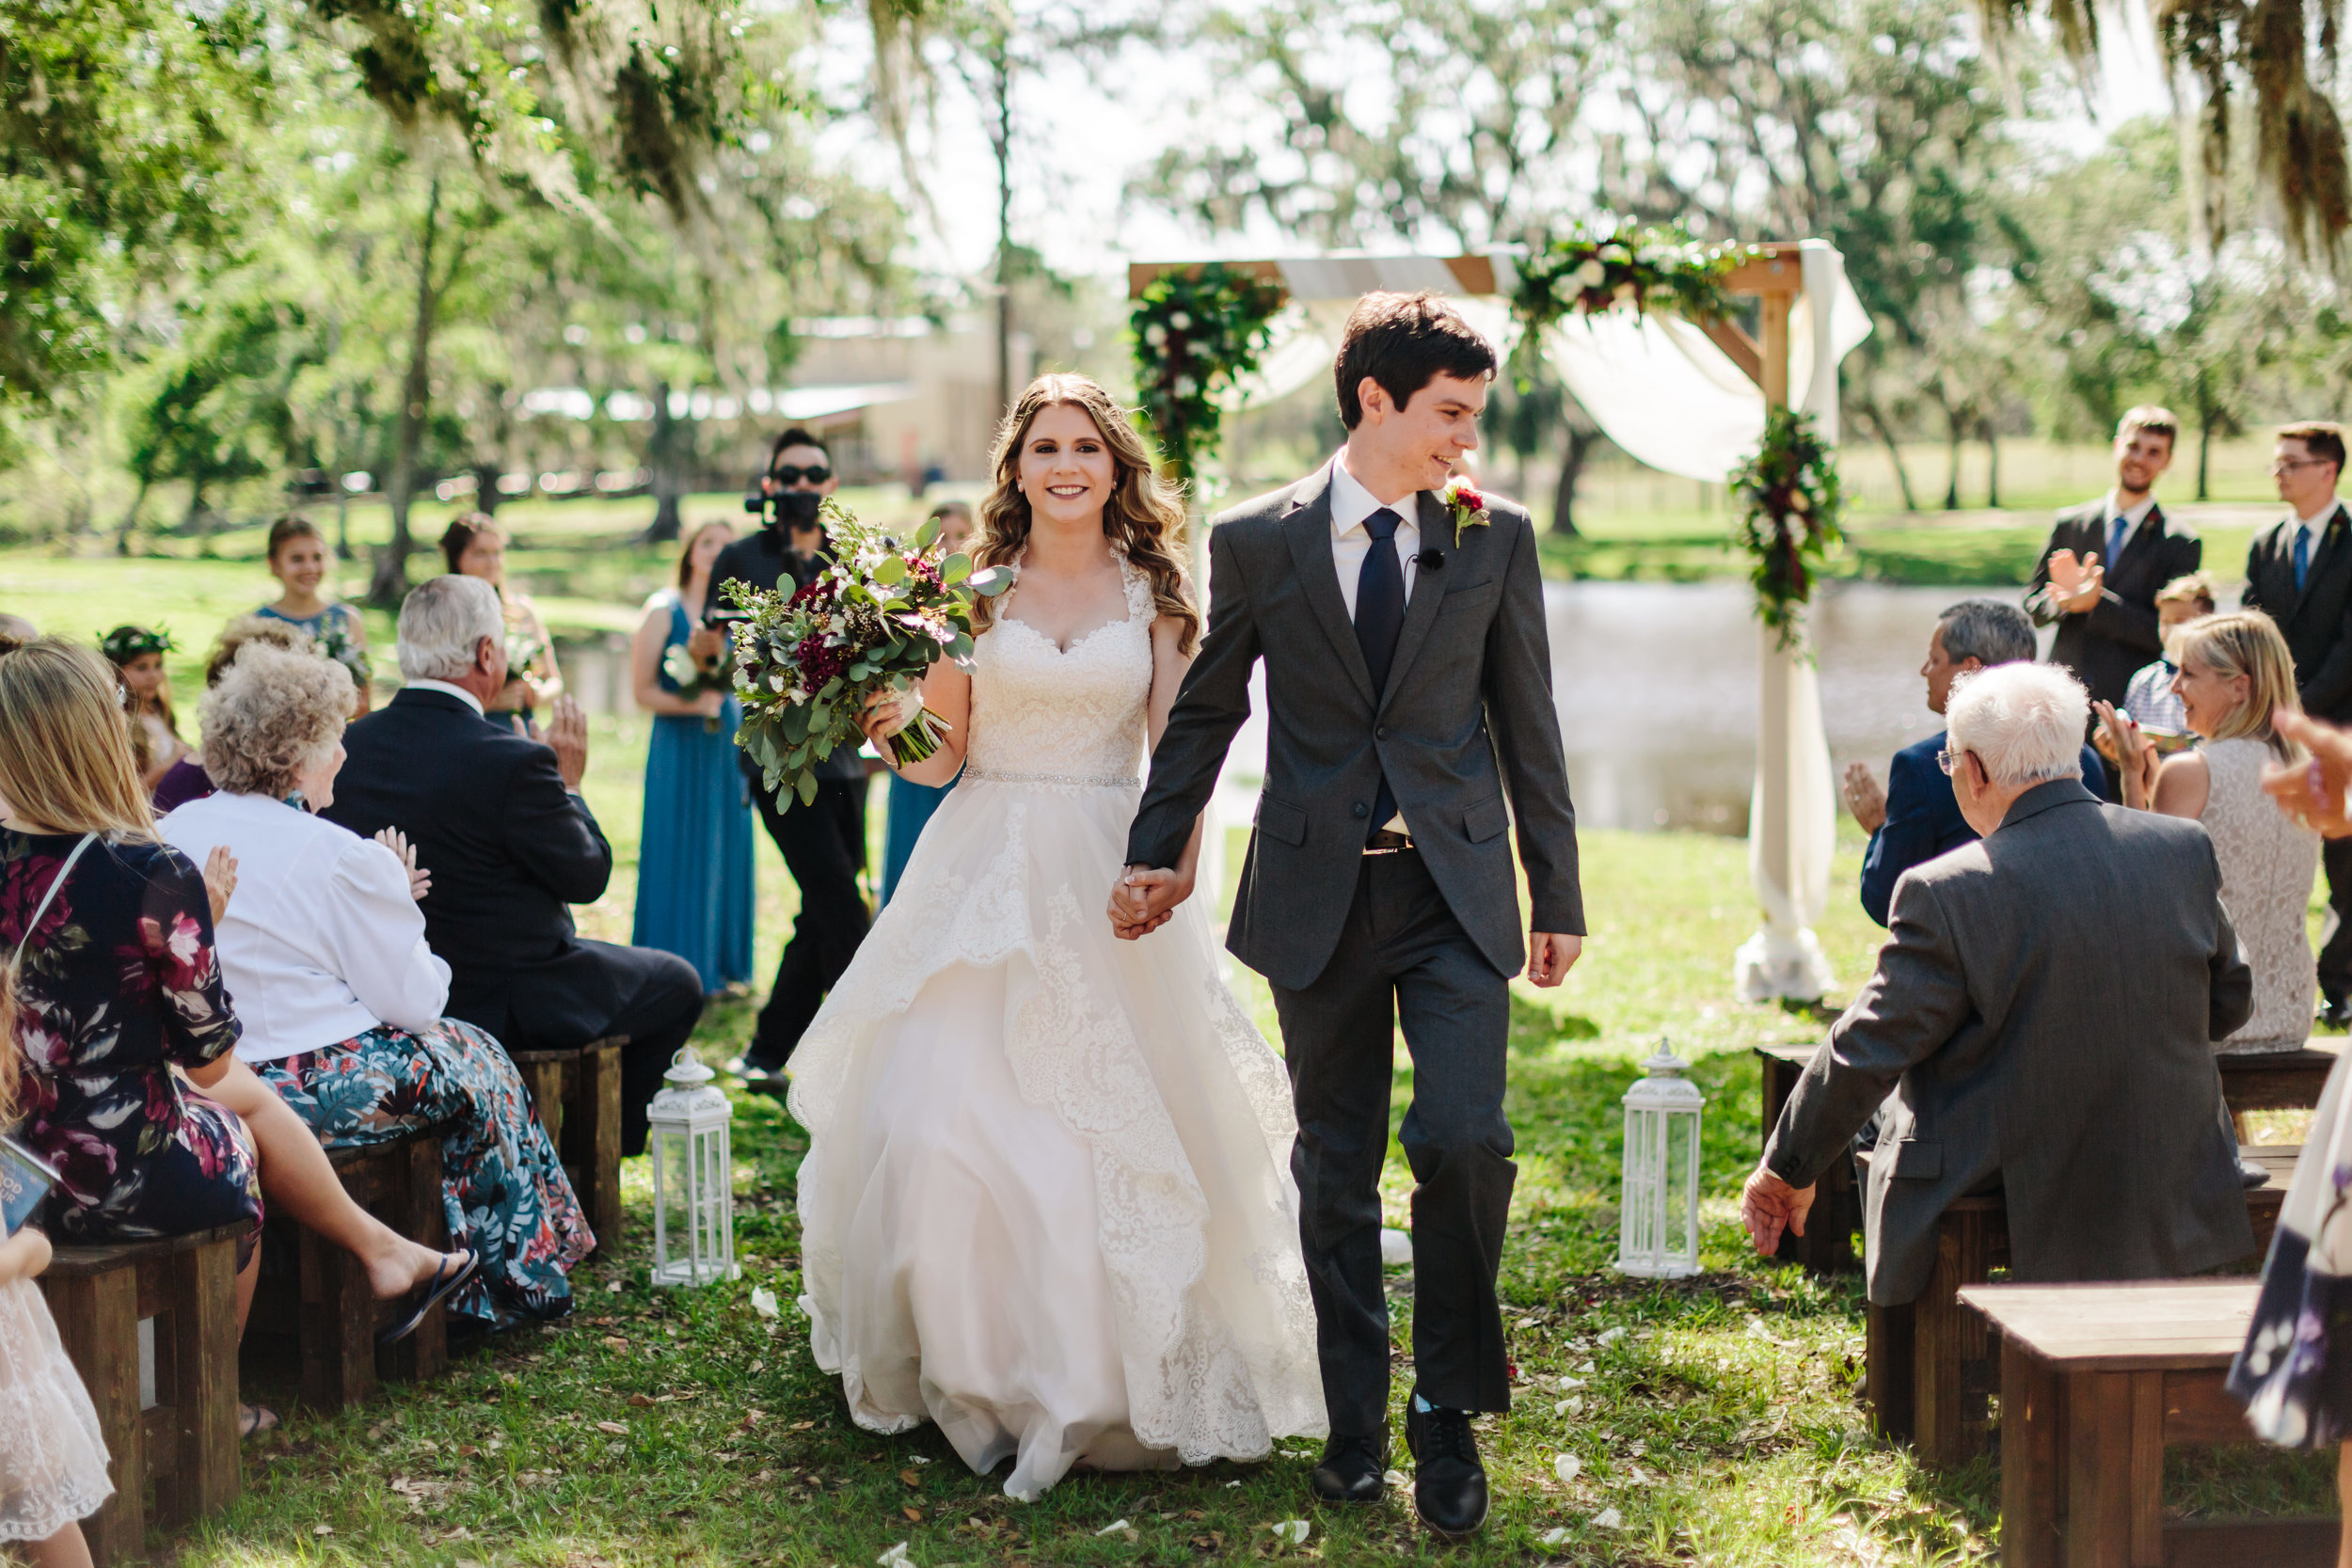 2018.04.14 Zak and Jamisyn Unrue Black Willow Barn Wedding Finals-410.jpg